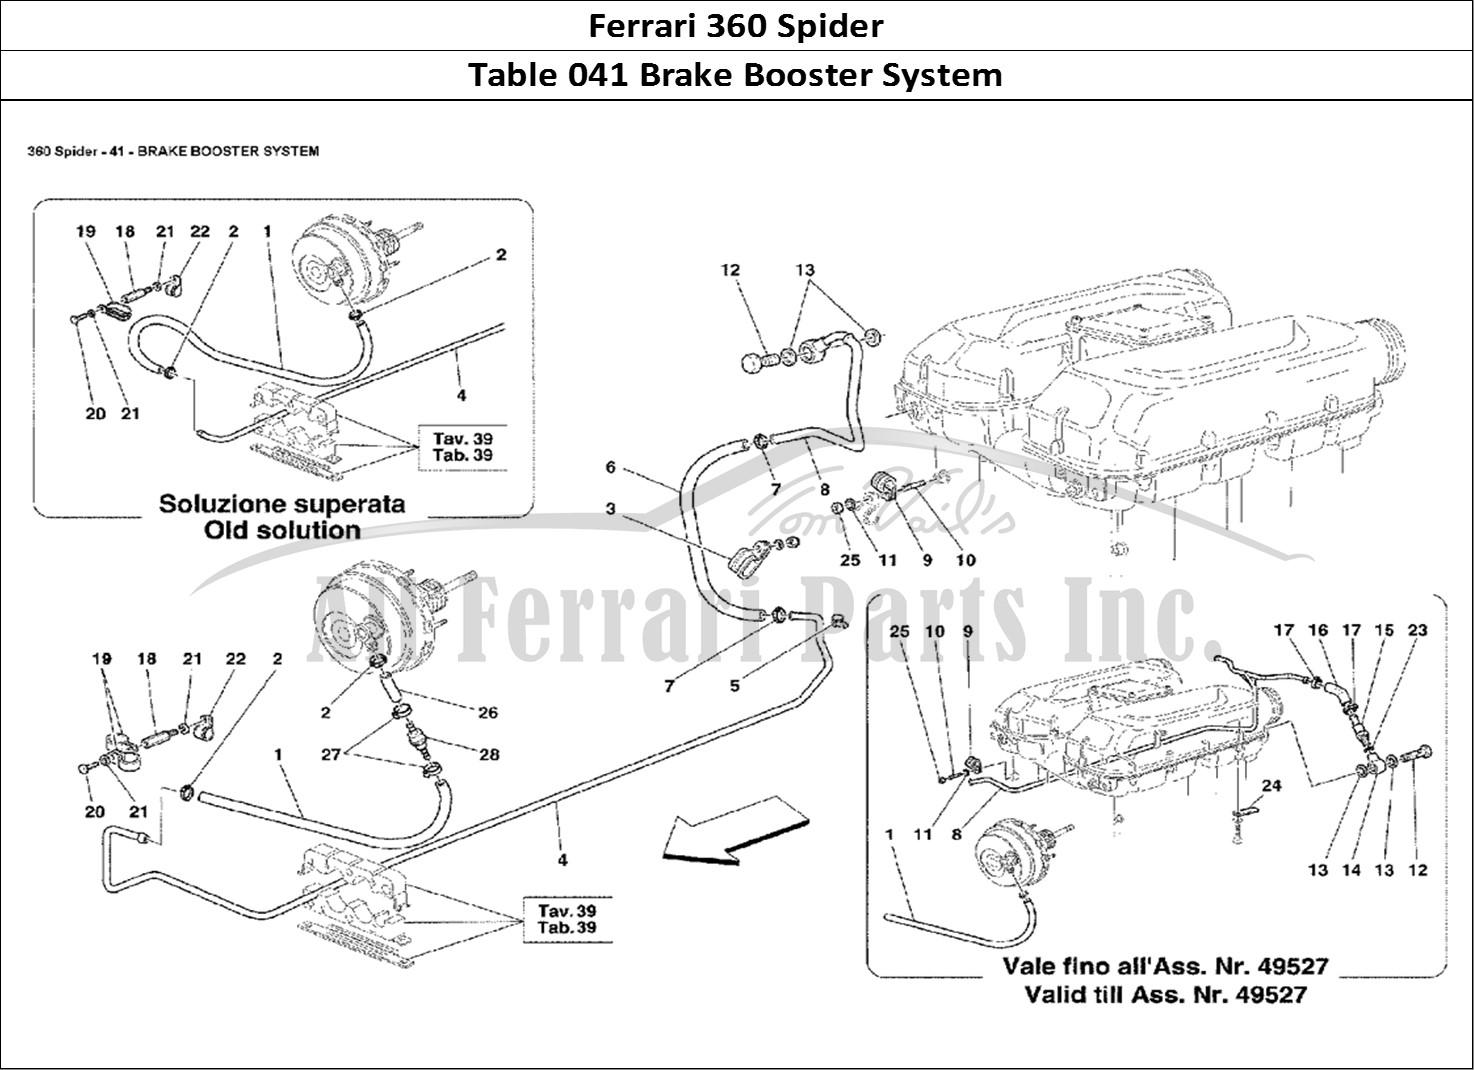 buy original ferrari 360 spider 041 brake booster system ferrari parts  spares  accessories online